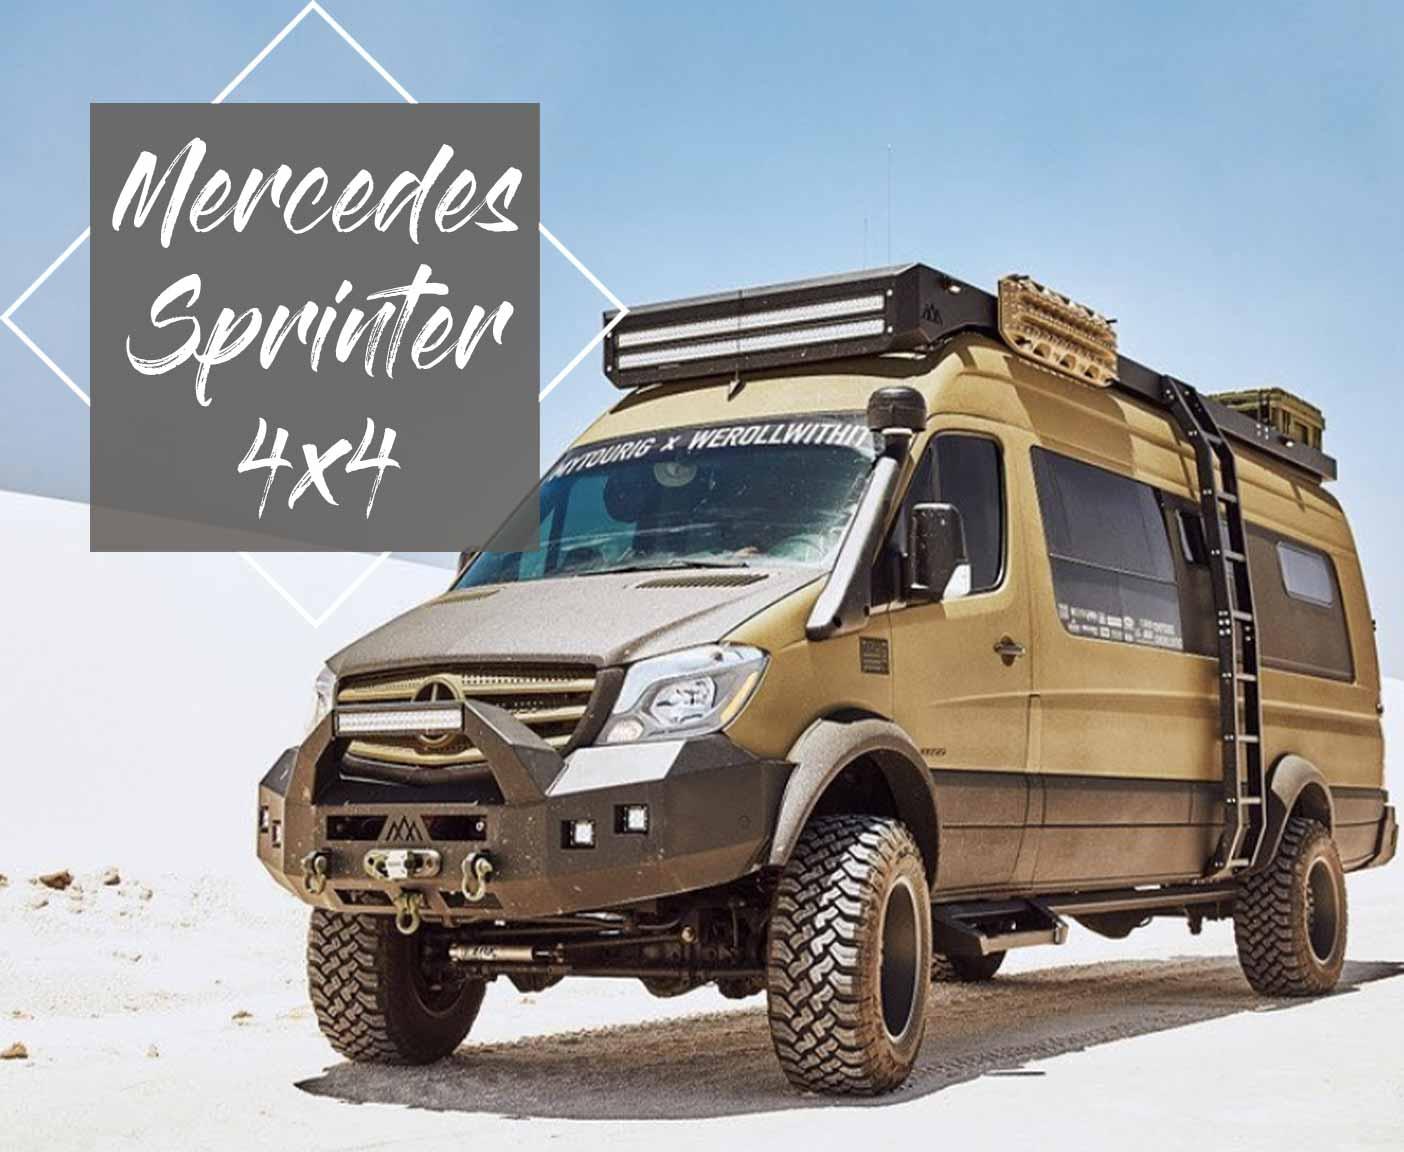 mercedes-benz-sprinter-4x4-tout-terrain-allrad-extreme-expedition-van-fourgon-poids-lourd-amenage-camping-car-roadtrip-vanlife-usa